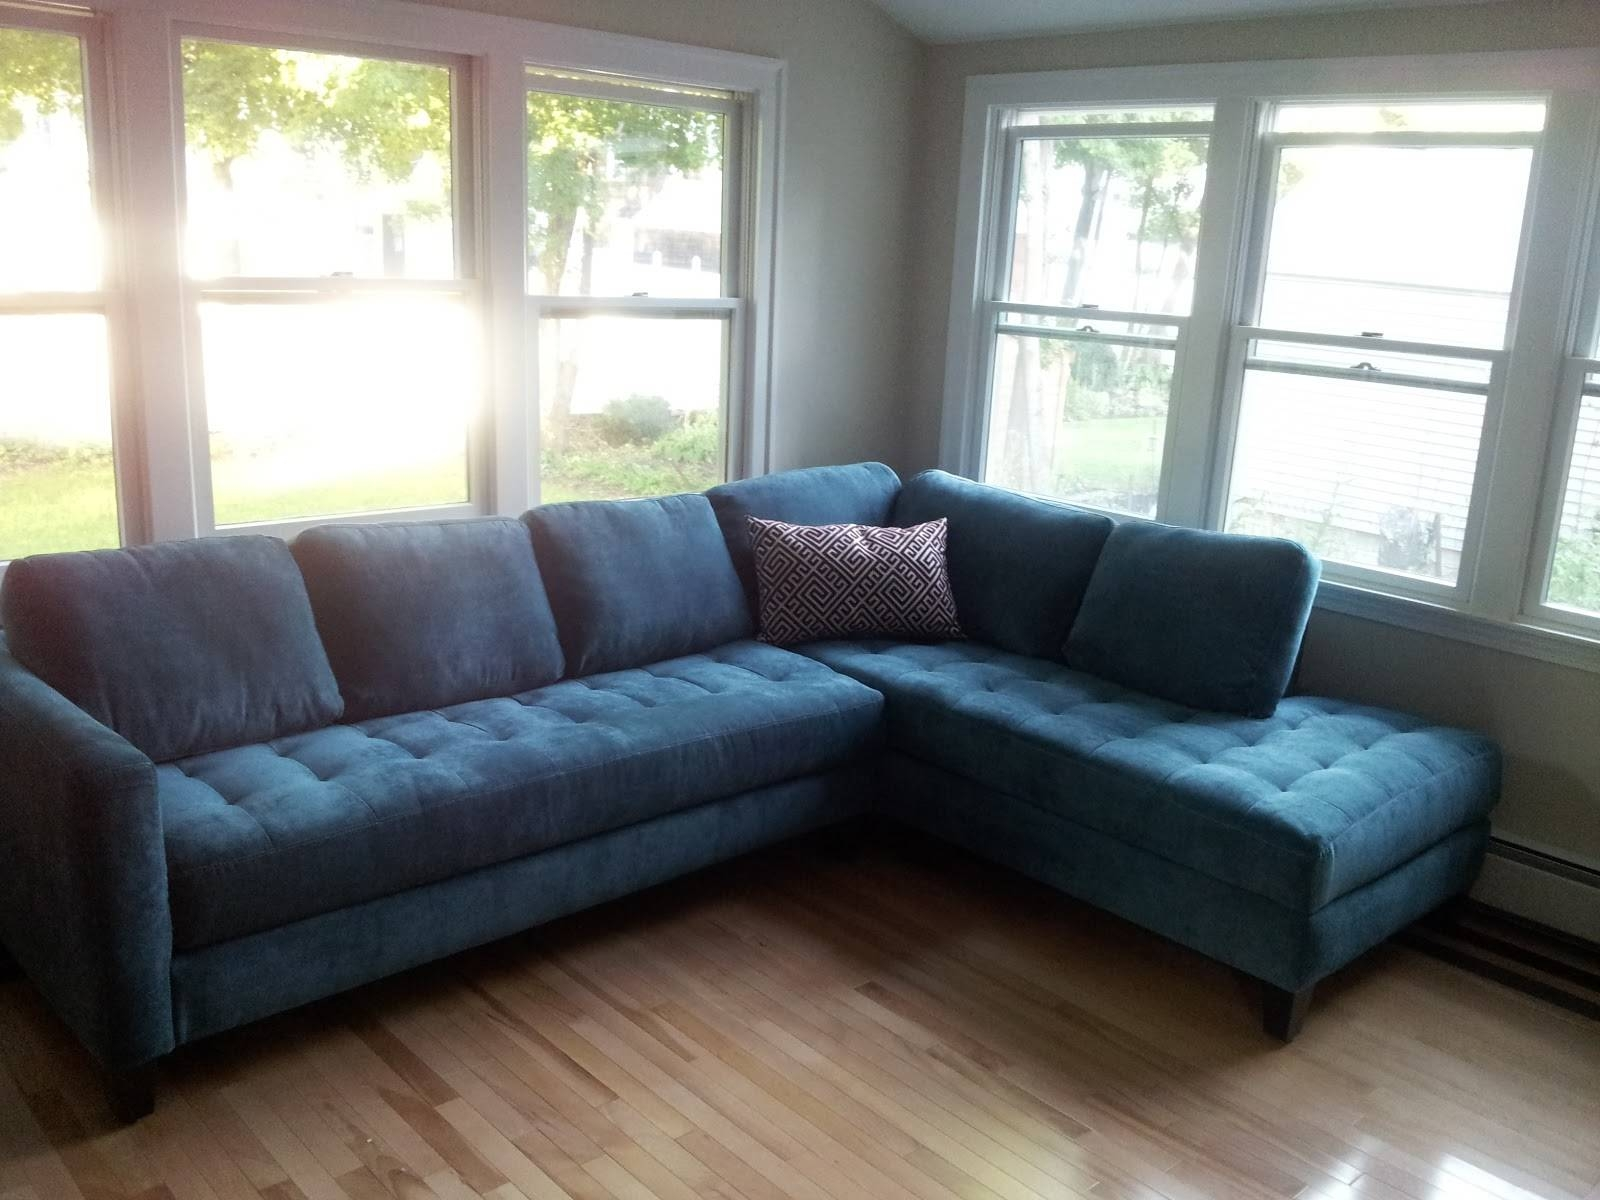 Furniture: Sophisticated Velvet Tufted Sofa For Living Room for Blue Tufted Sofas (Image 17 of 30)